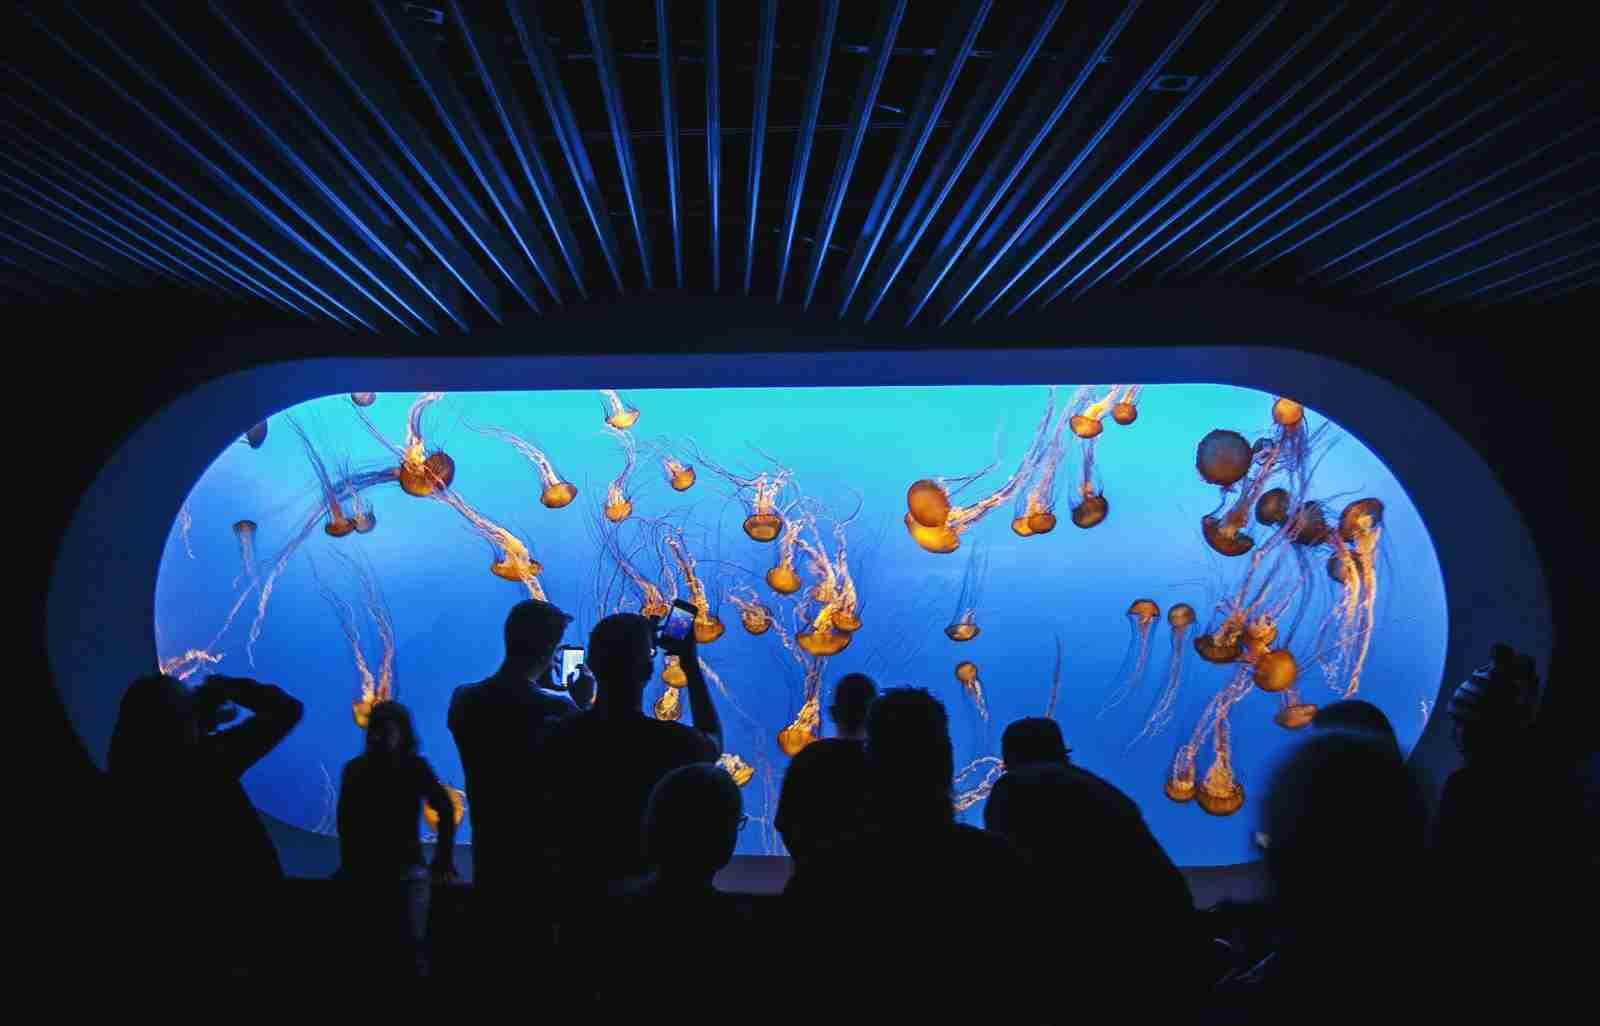 Monterey Bay Aquarium. (Photo by Denny Soetiono/EyeEm/Getty Images)